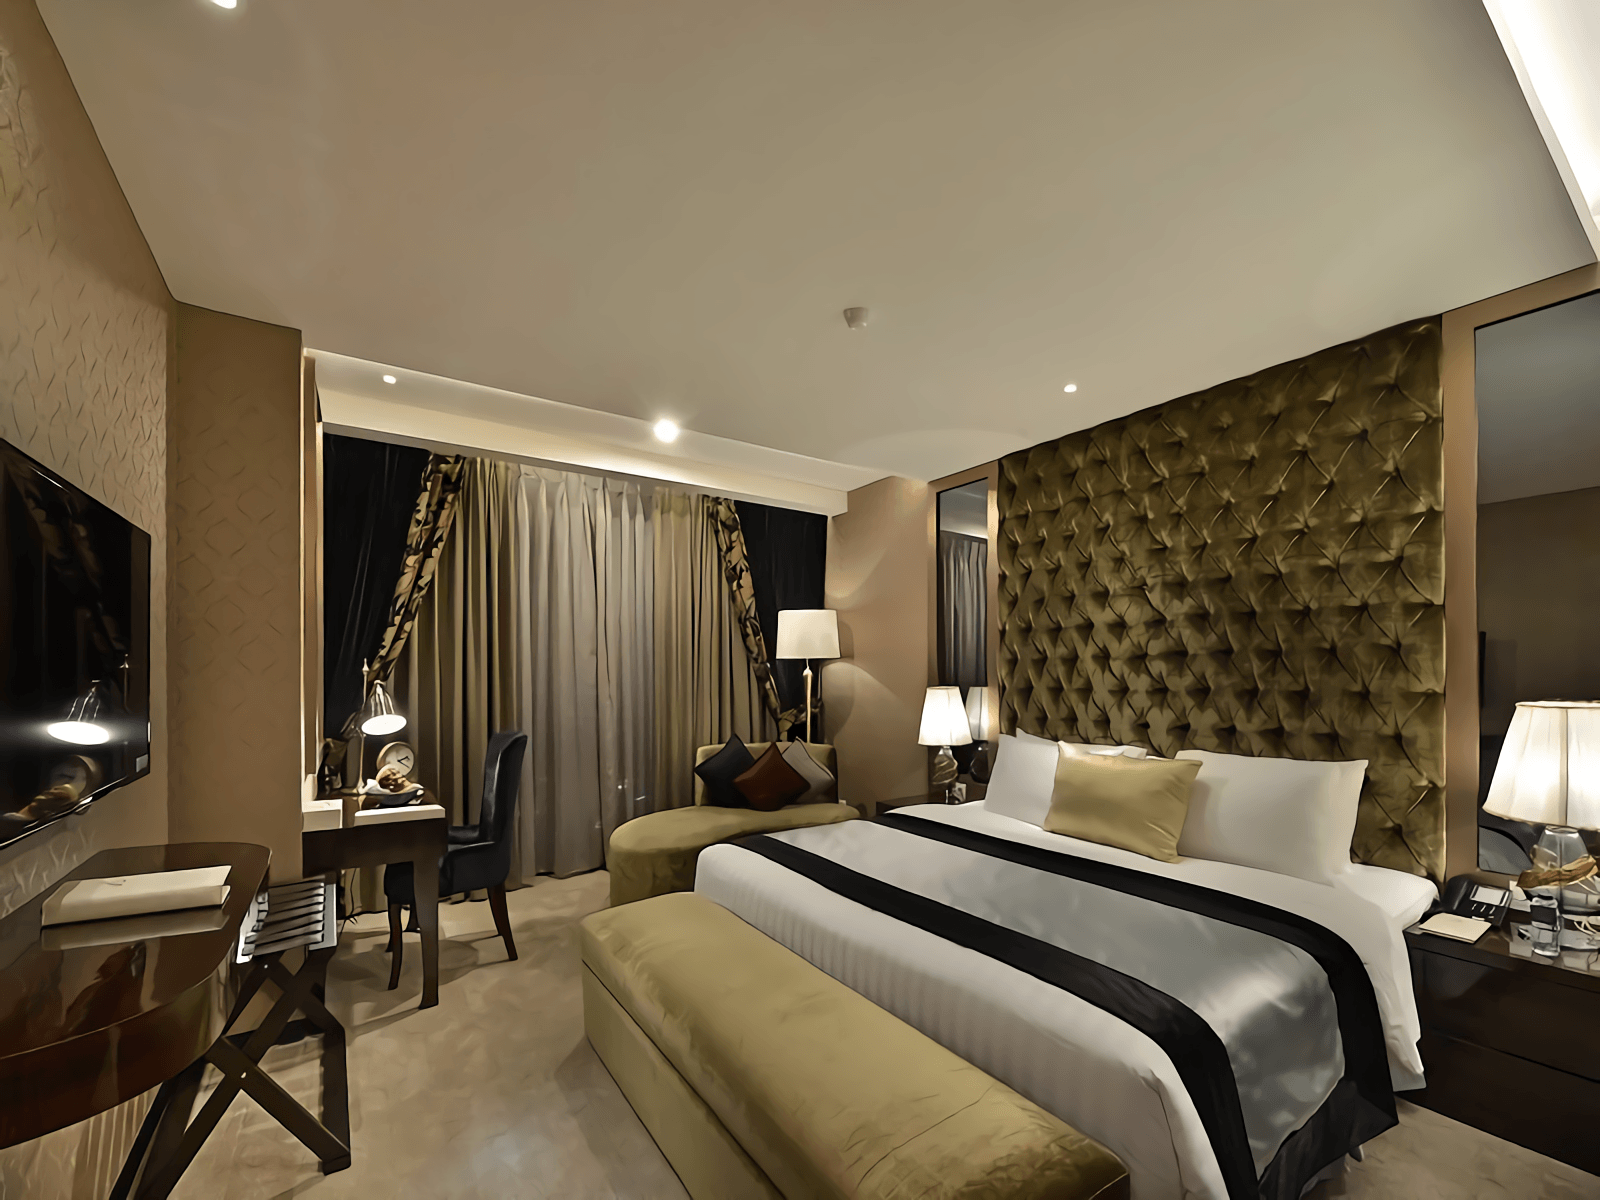 Pensil Desain Hotel Amaroossa Grande Bekasi, Tambelang, Bekasi, Jawa Barat, Indonesia Bekasi, Tambelang, Bekasi, Jawa Barat, Indonesia Bedroom View Modern  50215